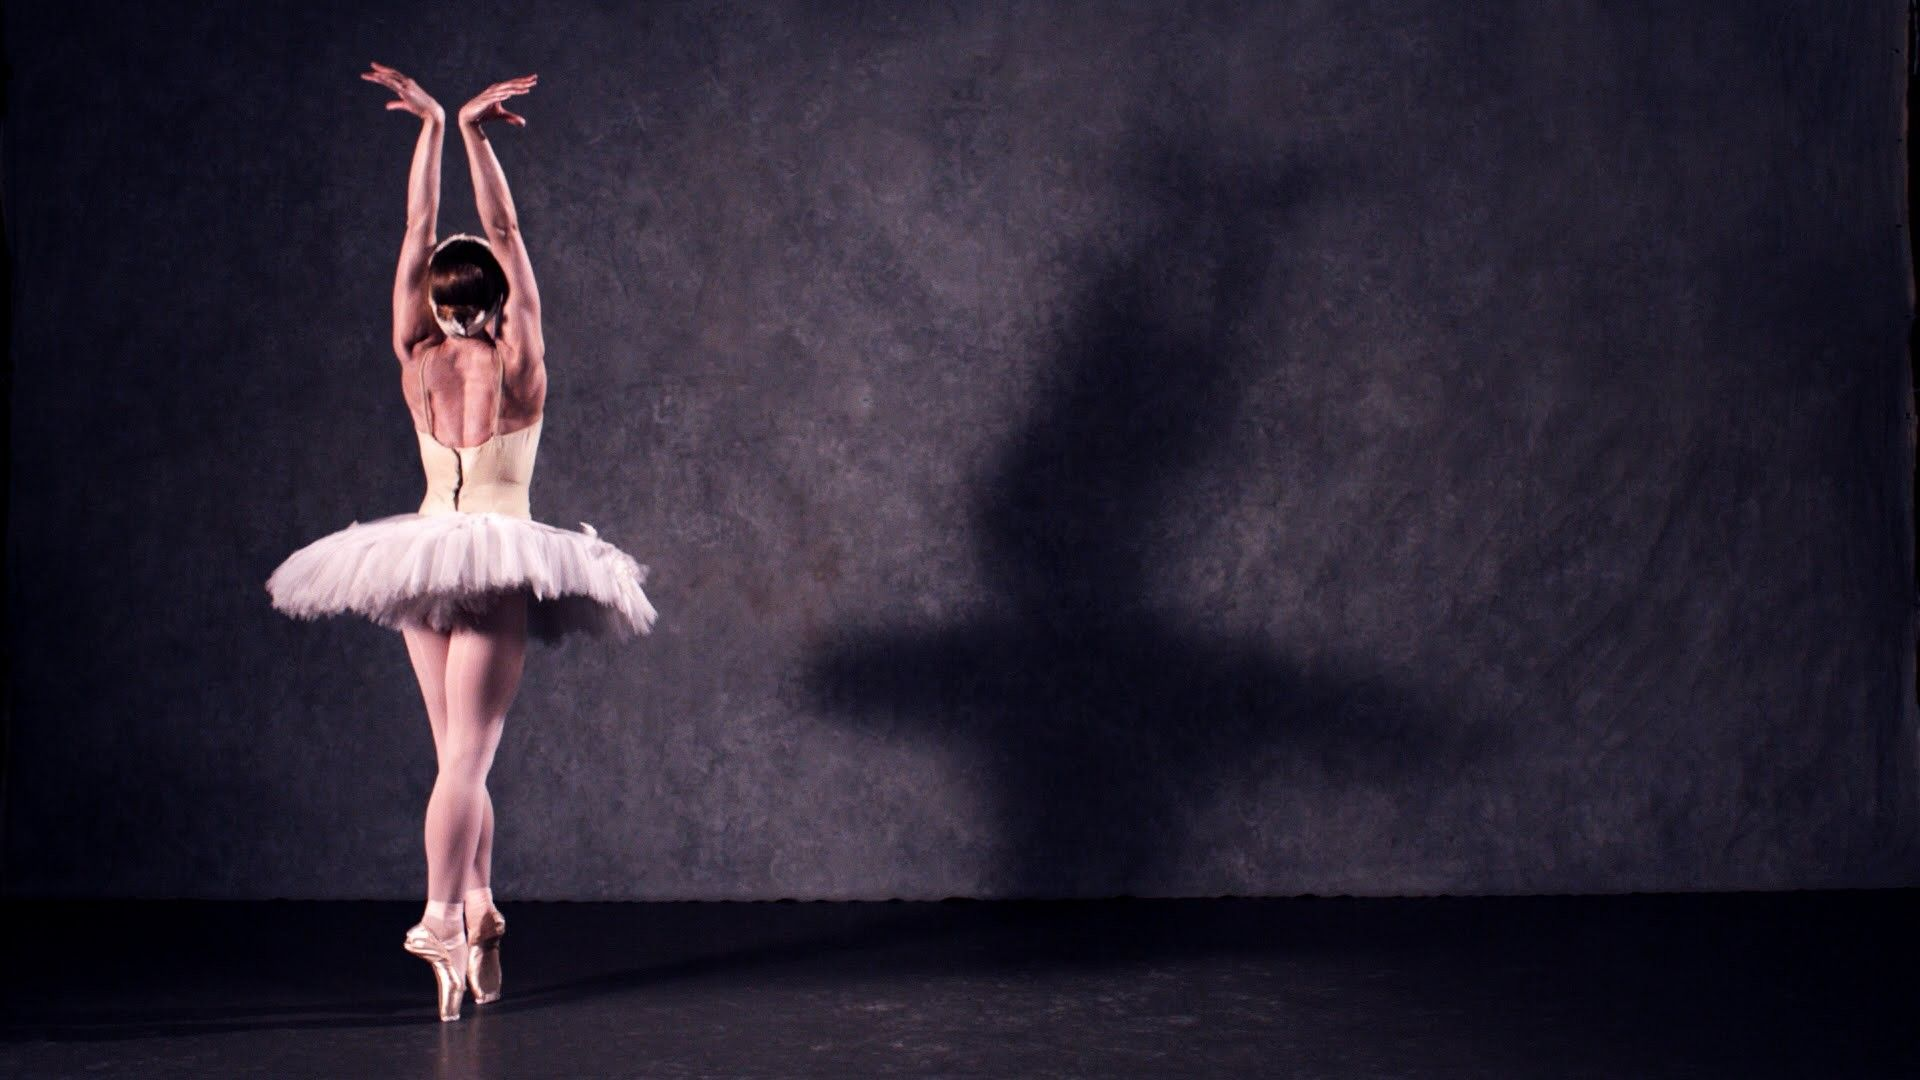 Ballet Dance Wallpapers Hd Dodskypict: Ballet Dance Wallpapers With HD Desktop 1920x1080 Px 212